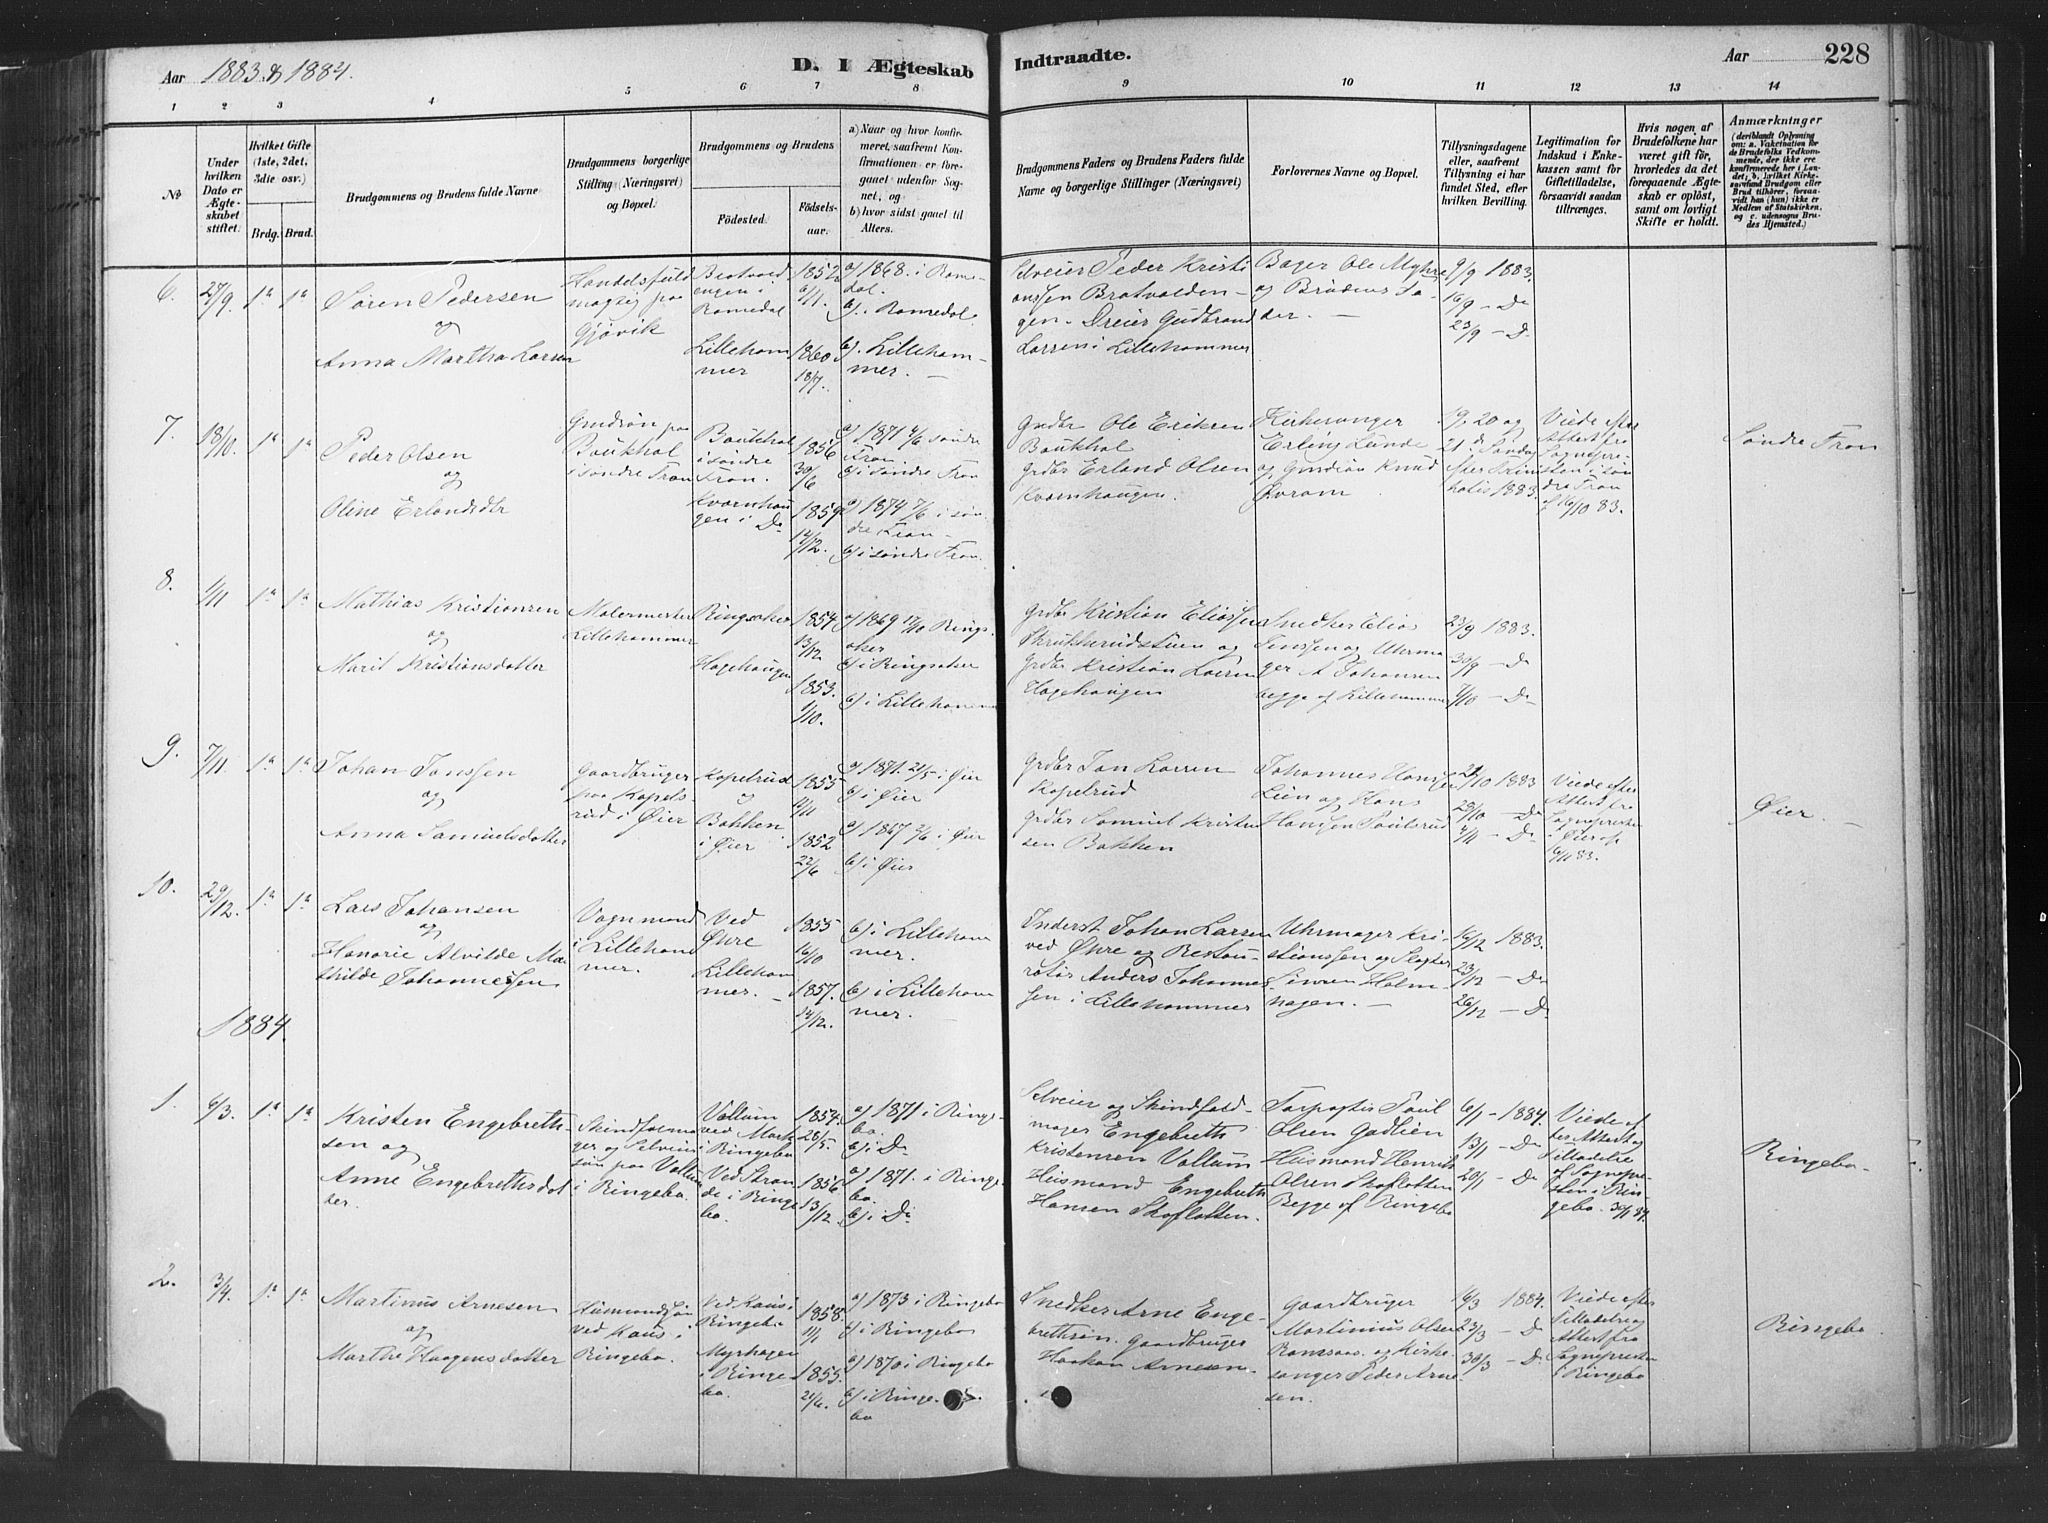 SAH, Fåberg prestekontor, Ministerialbok nr. 10, 1879-1900, s. 228